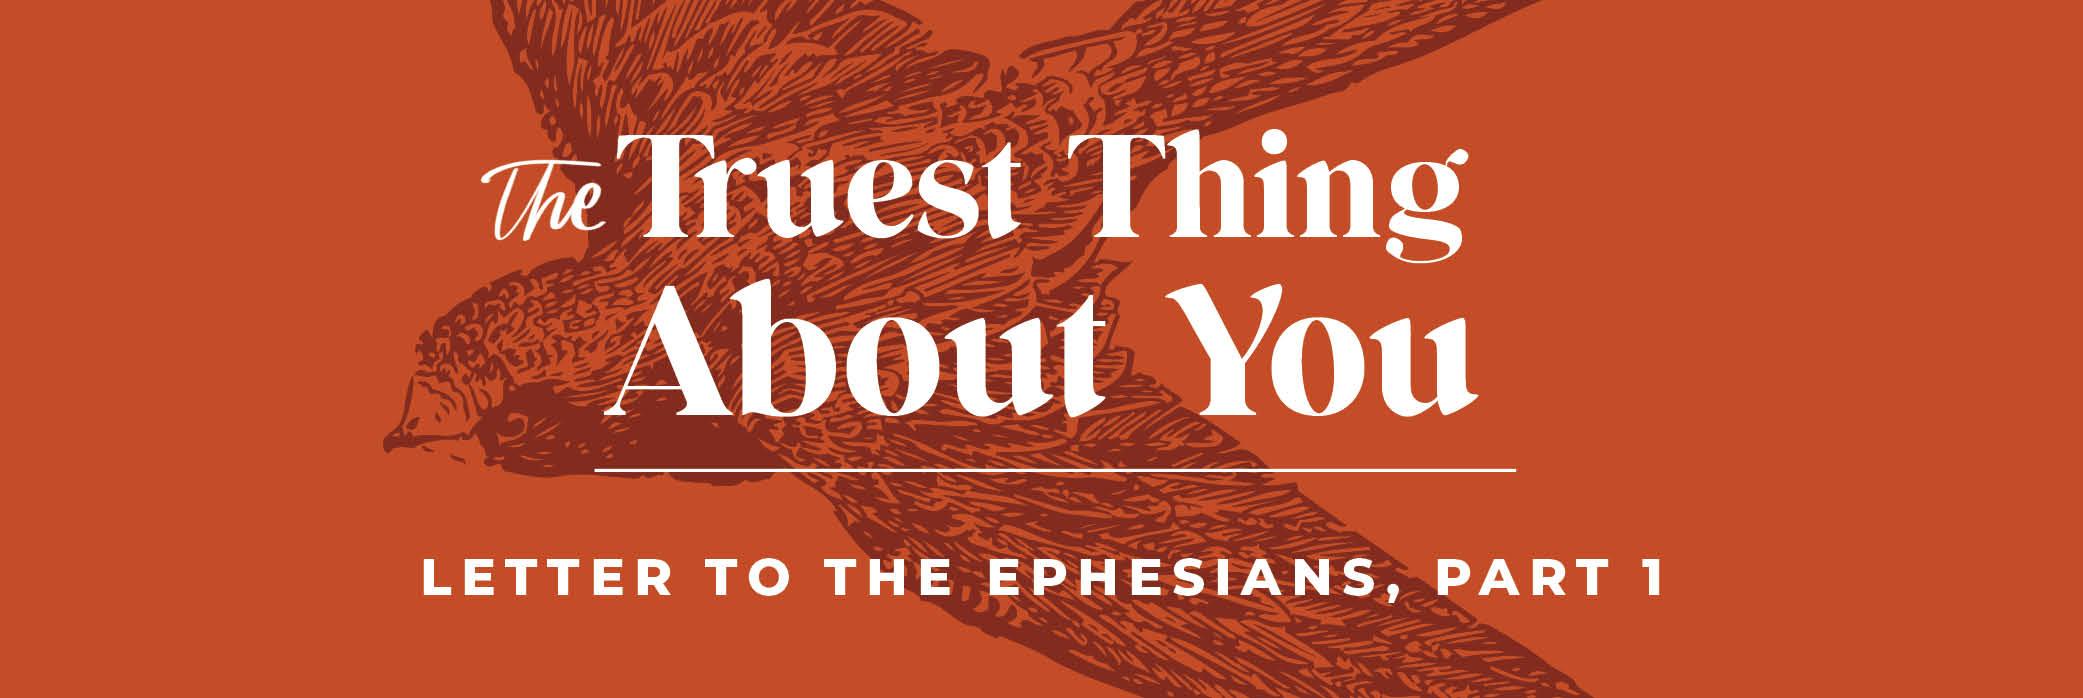 Ephesians- Web banner .jpg